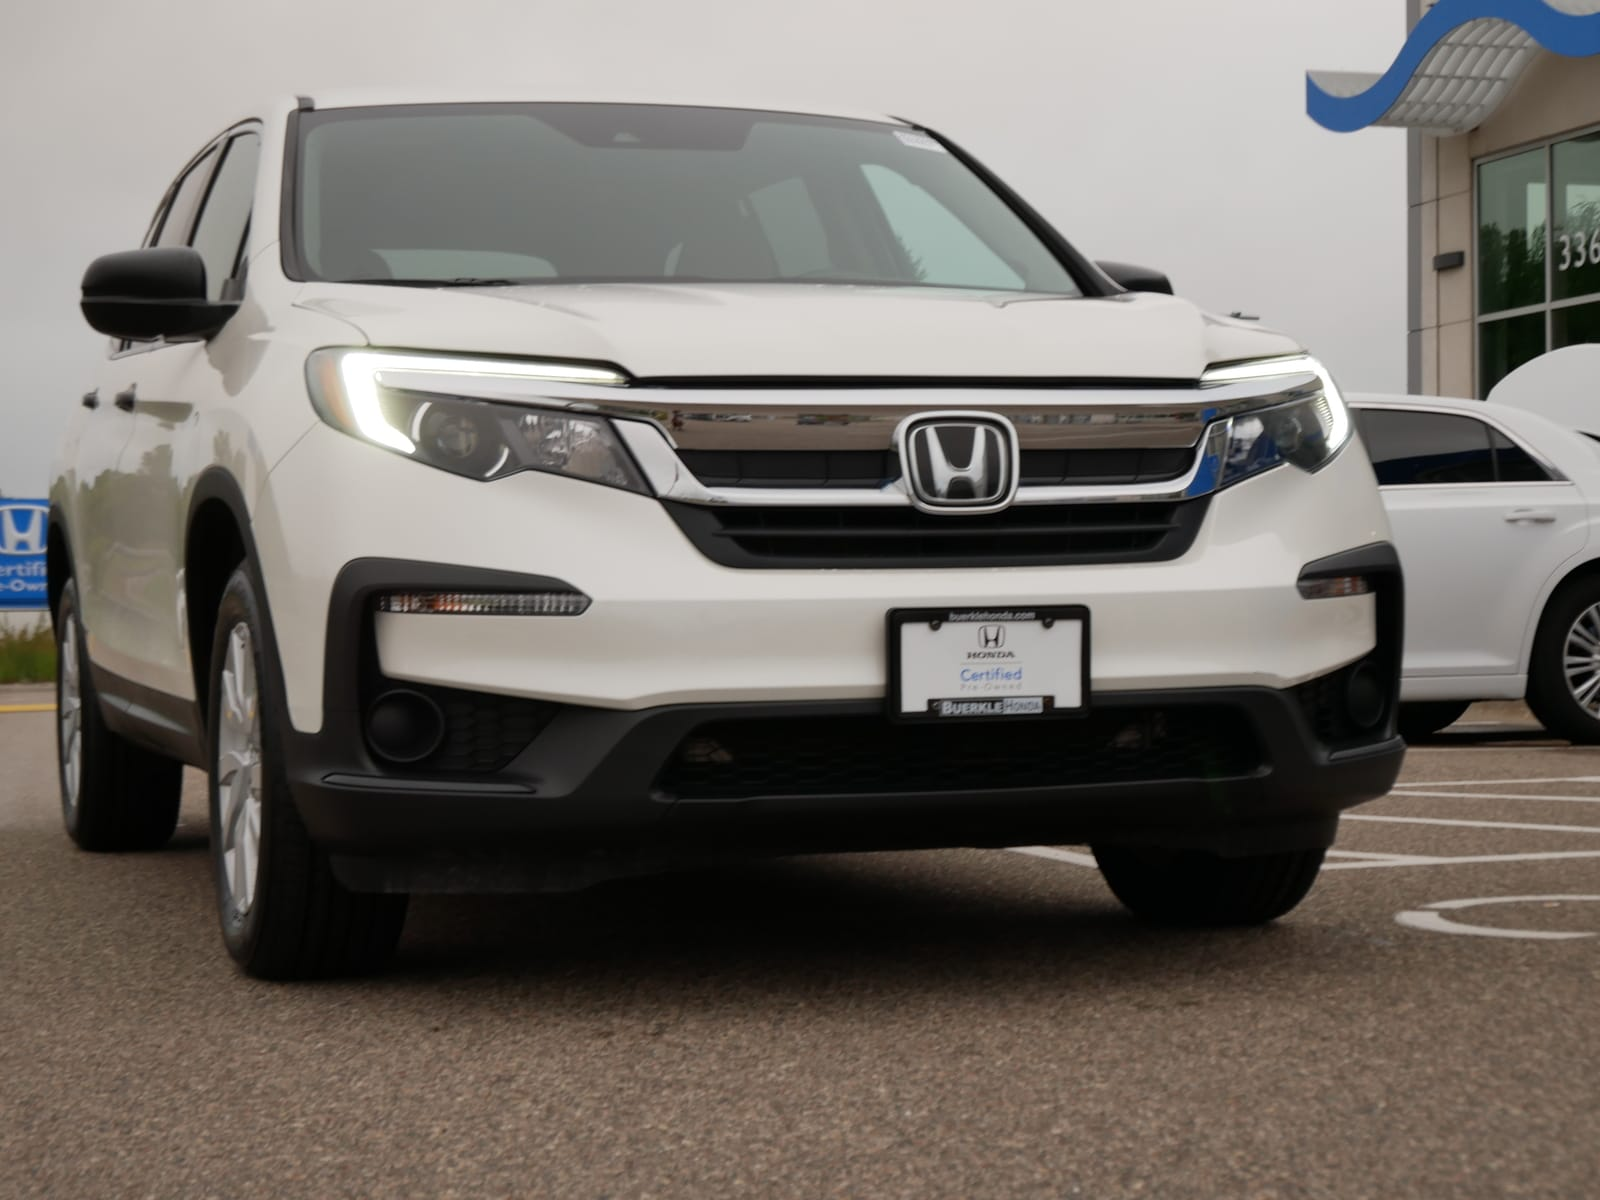 Certified 2019 Honda Pilot LX with VIN 5FNYF6H15KB067568 for sale in Saint Paul, Minnesota